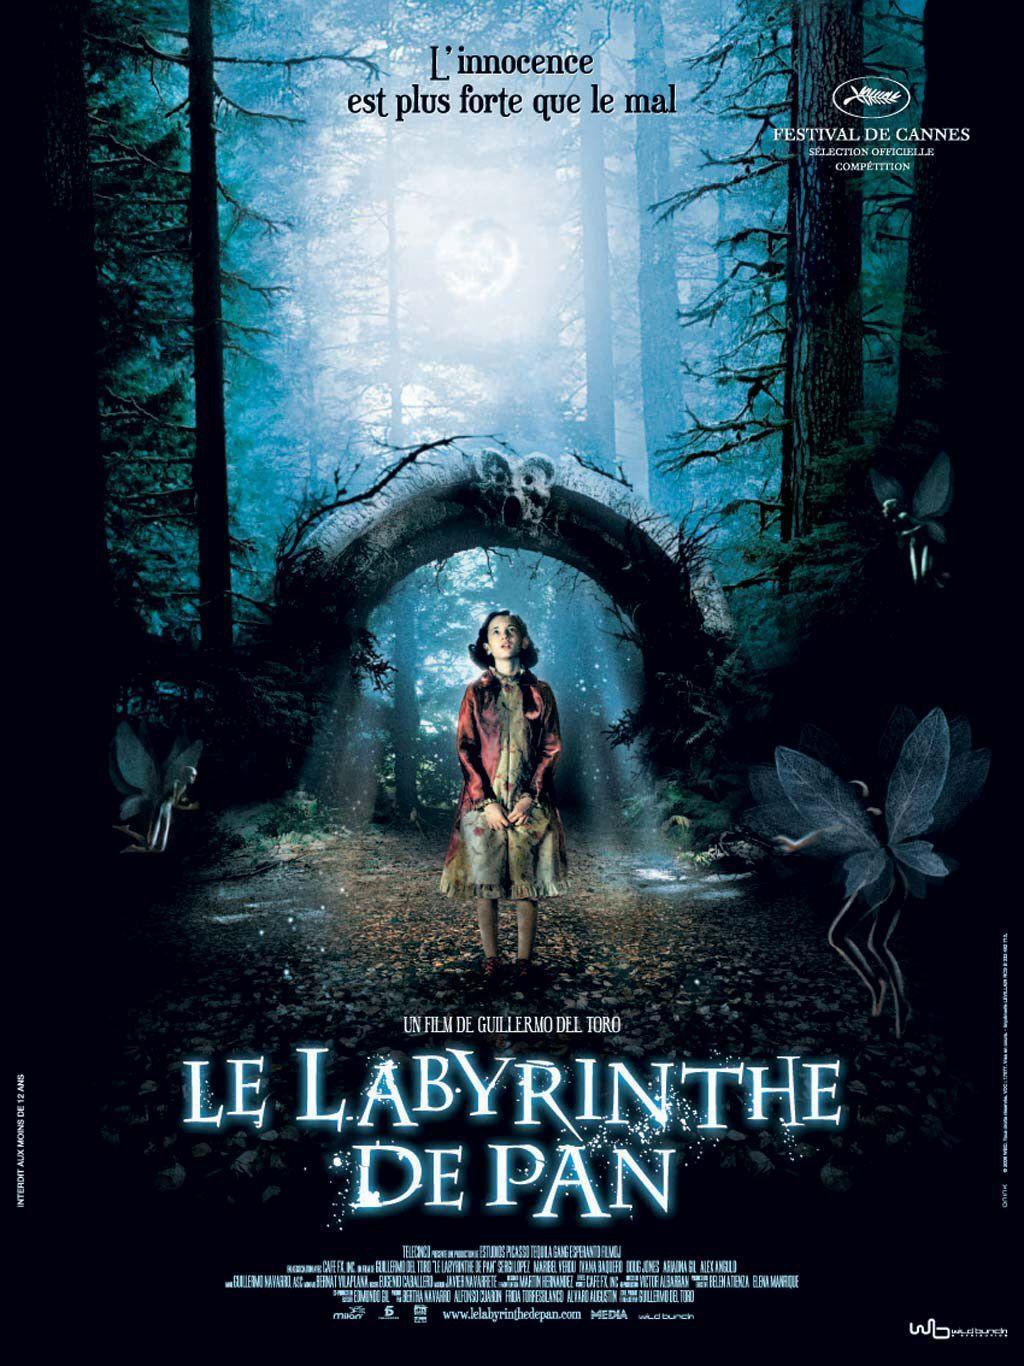 Le Labyrinthe de Pan (2006) de Guillermo Del Toro